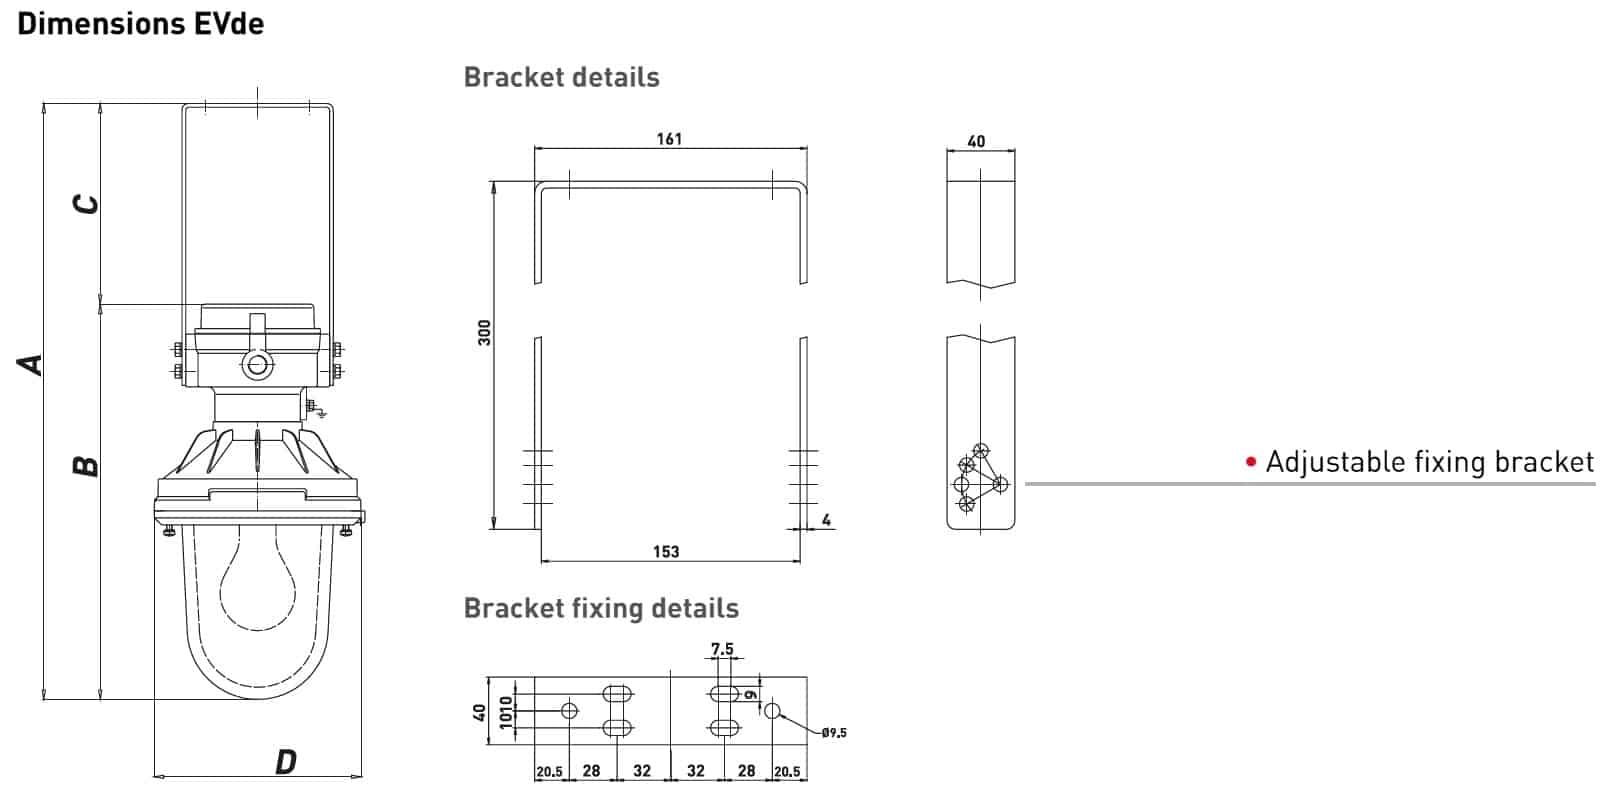 Explosion Proof Hazardous Area Technor EV Wellglass Lighting - EVde Dimensions